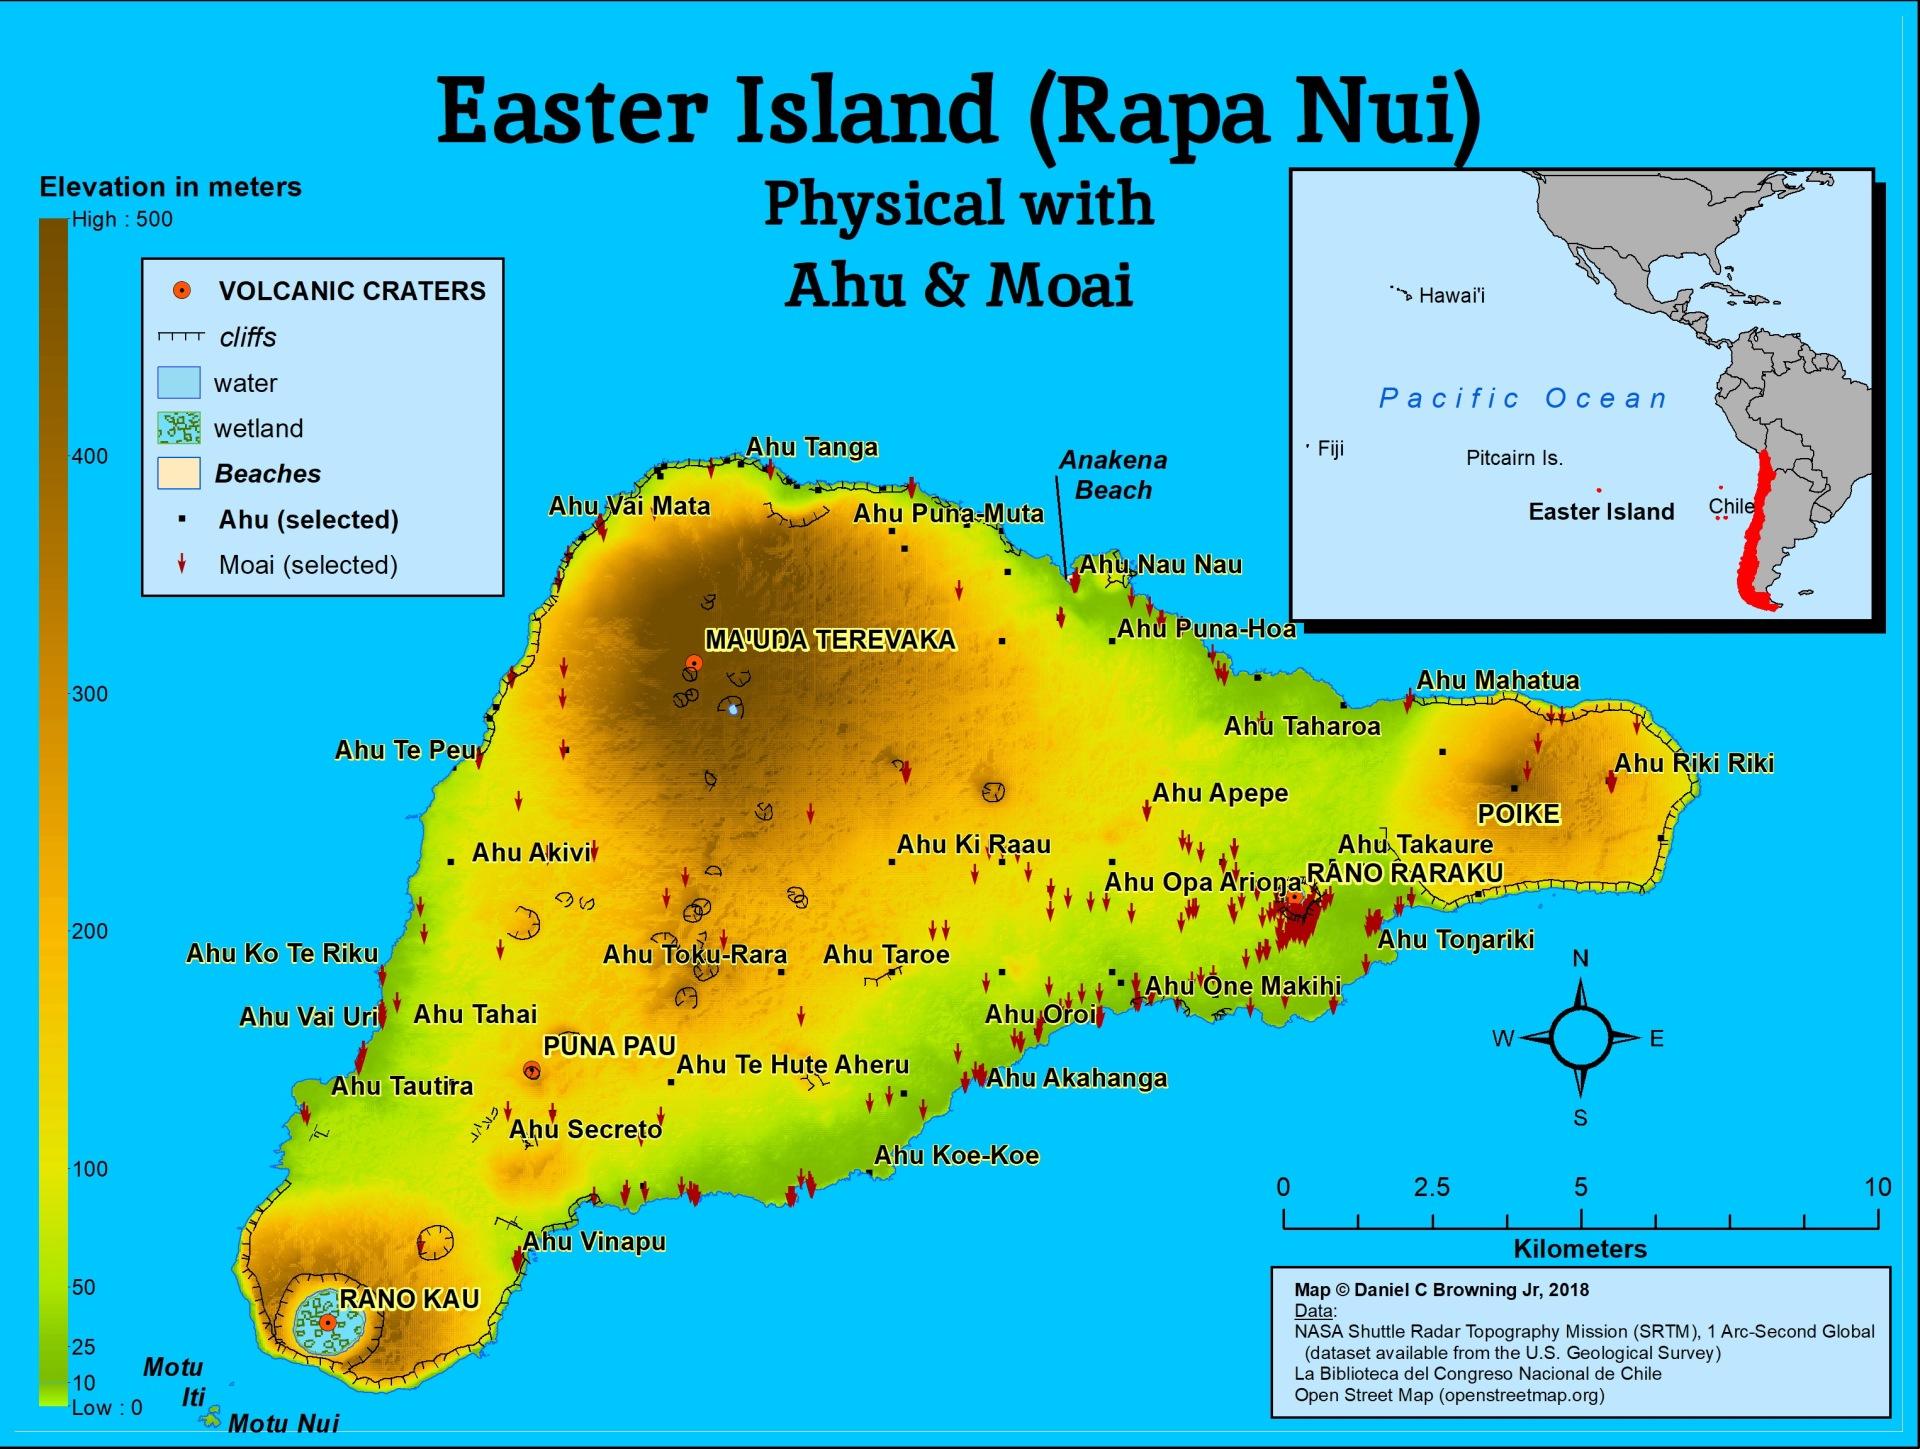 Rapa_Nui-Ahu_Moai